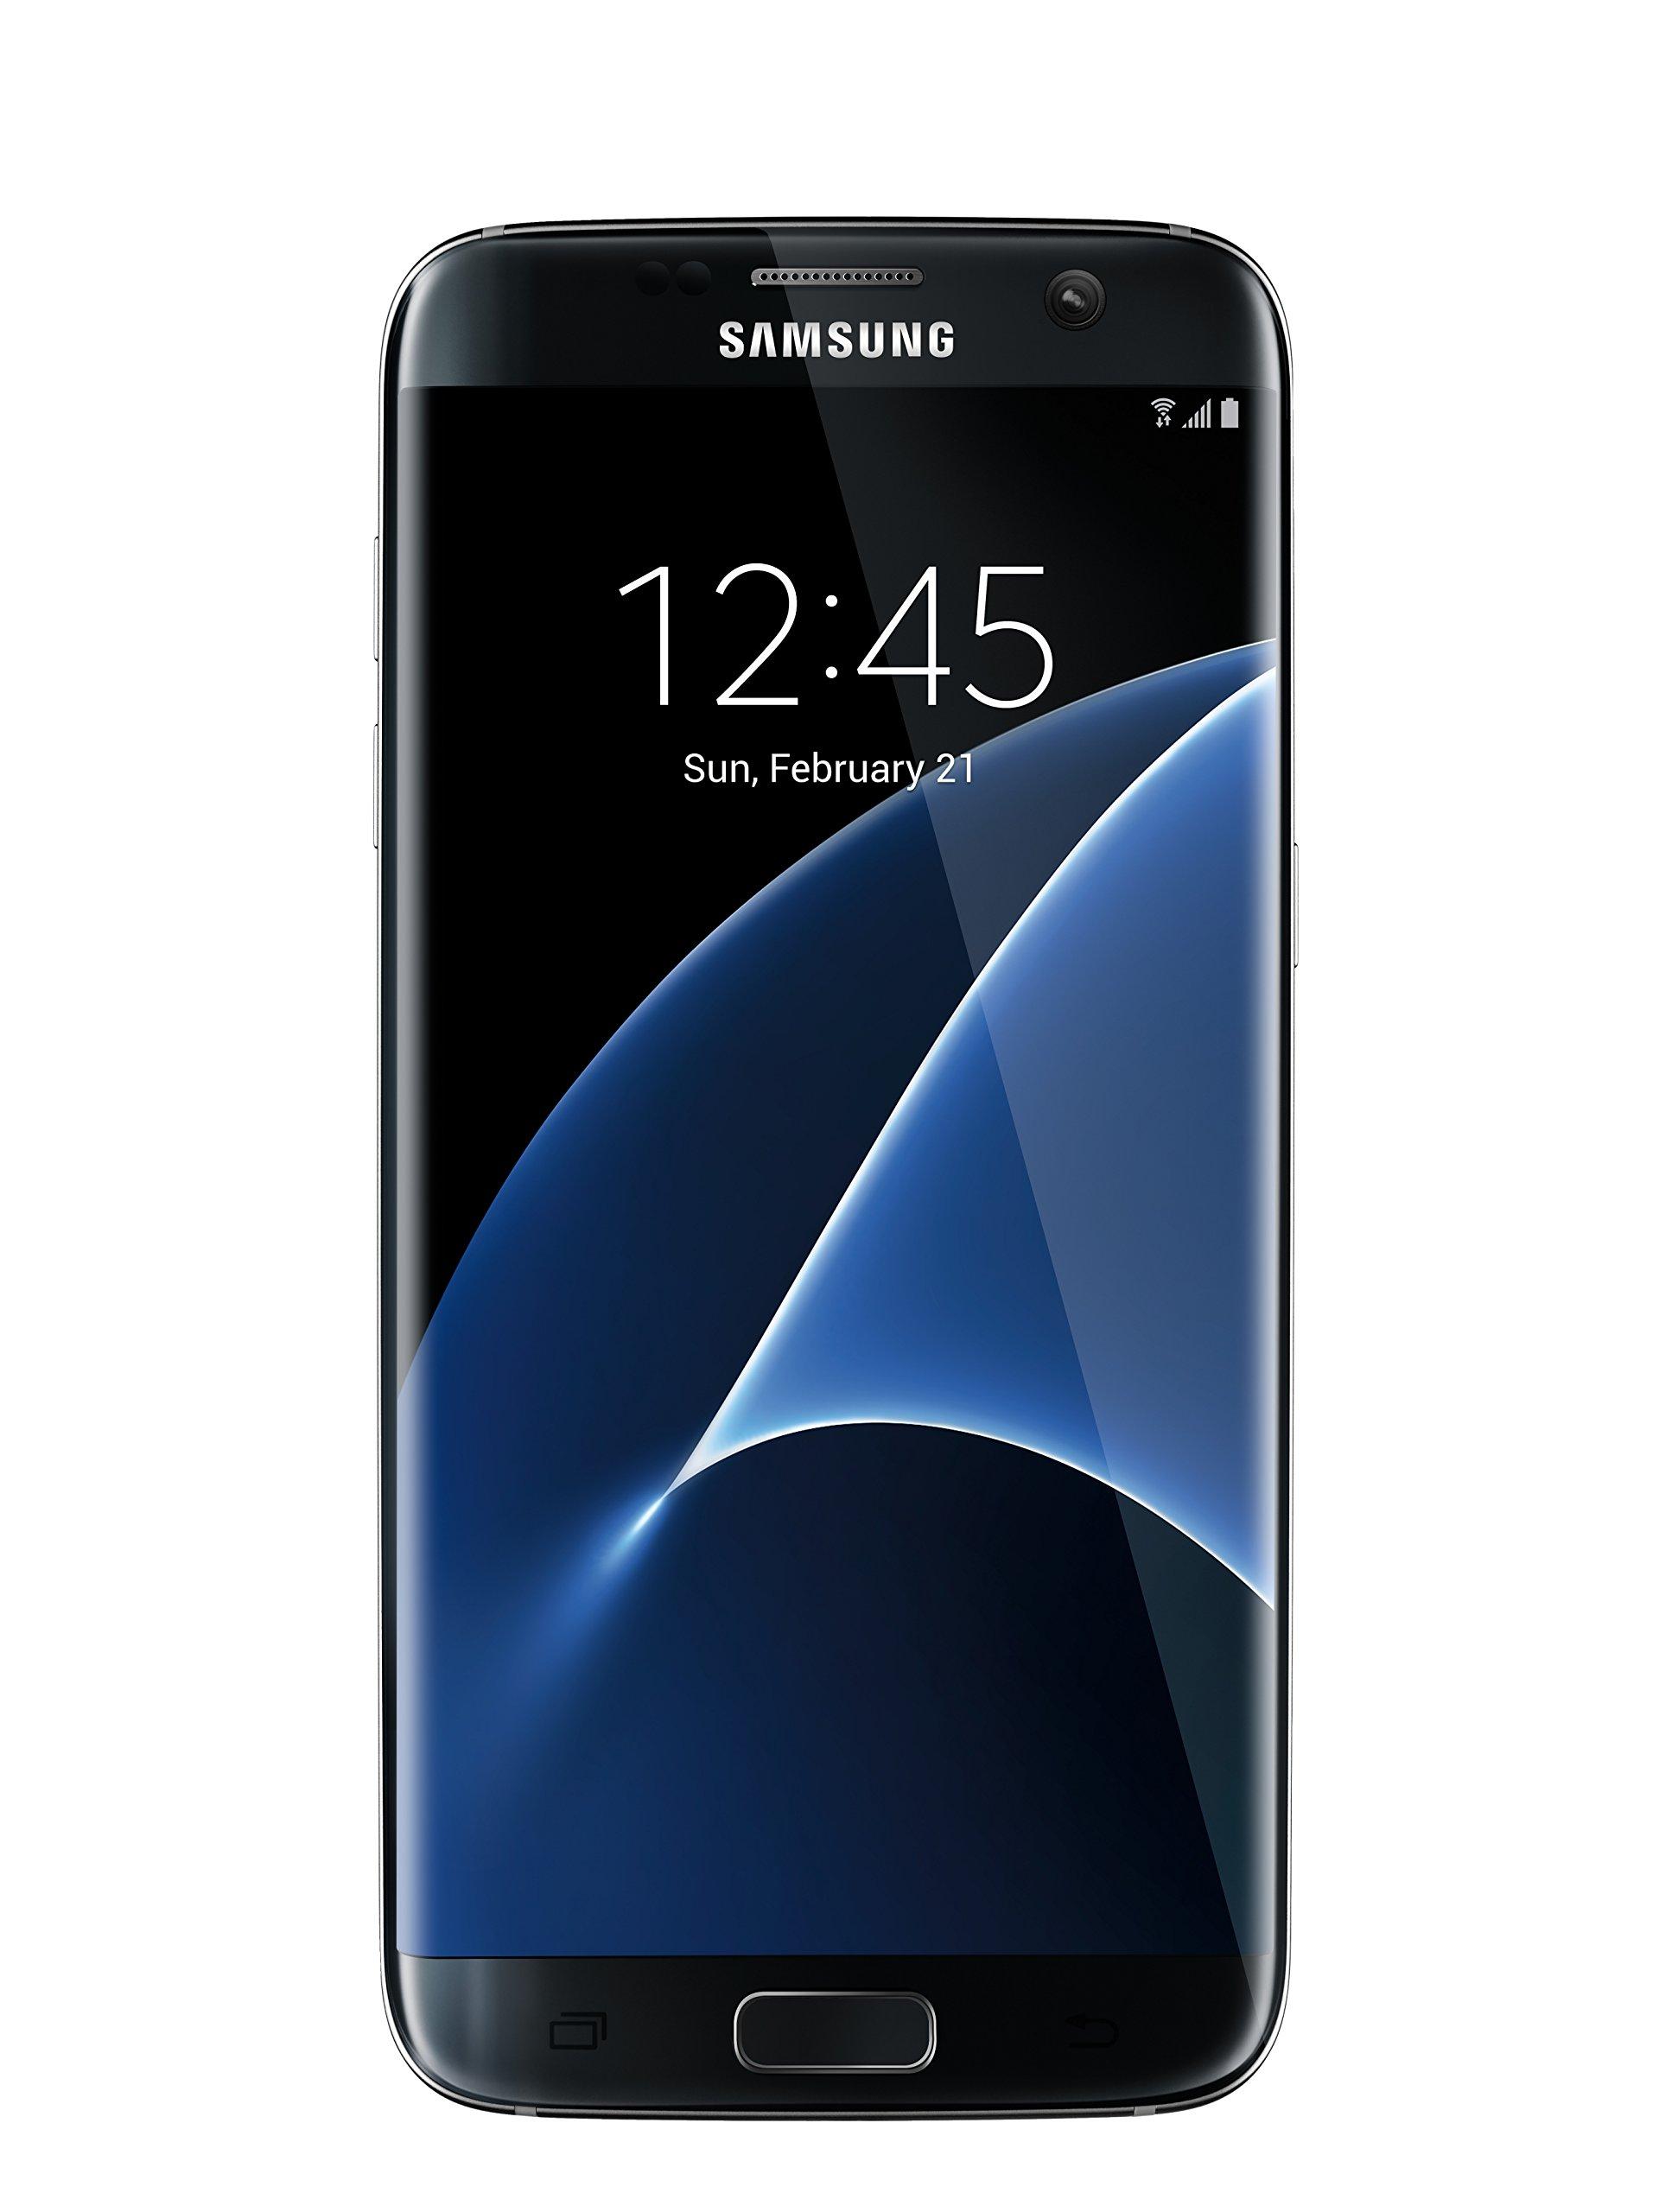 Samsung Galaxy S7 Edge G935F Factory Unlocked Phone 32 GB, No Warranty - International Version (Black Onyx) by Samsung (Image #1)